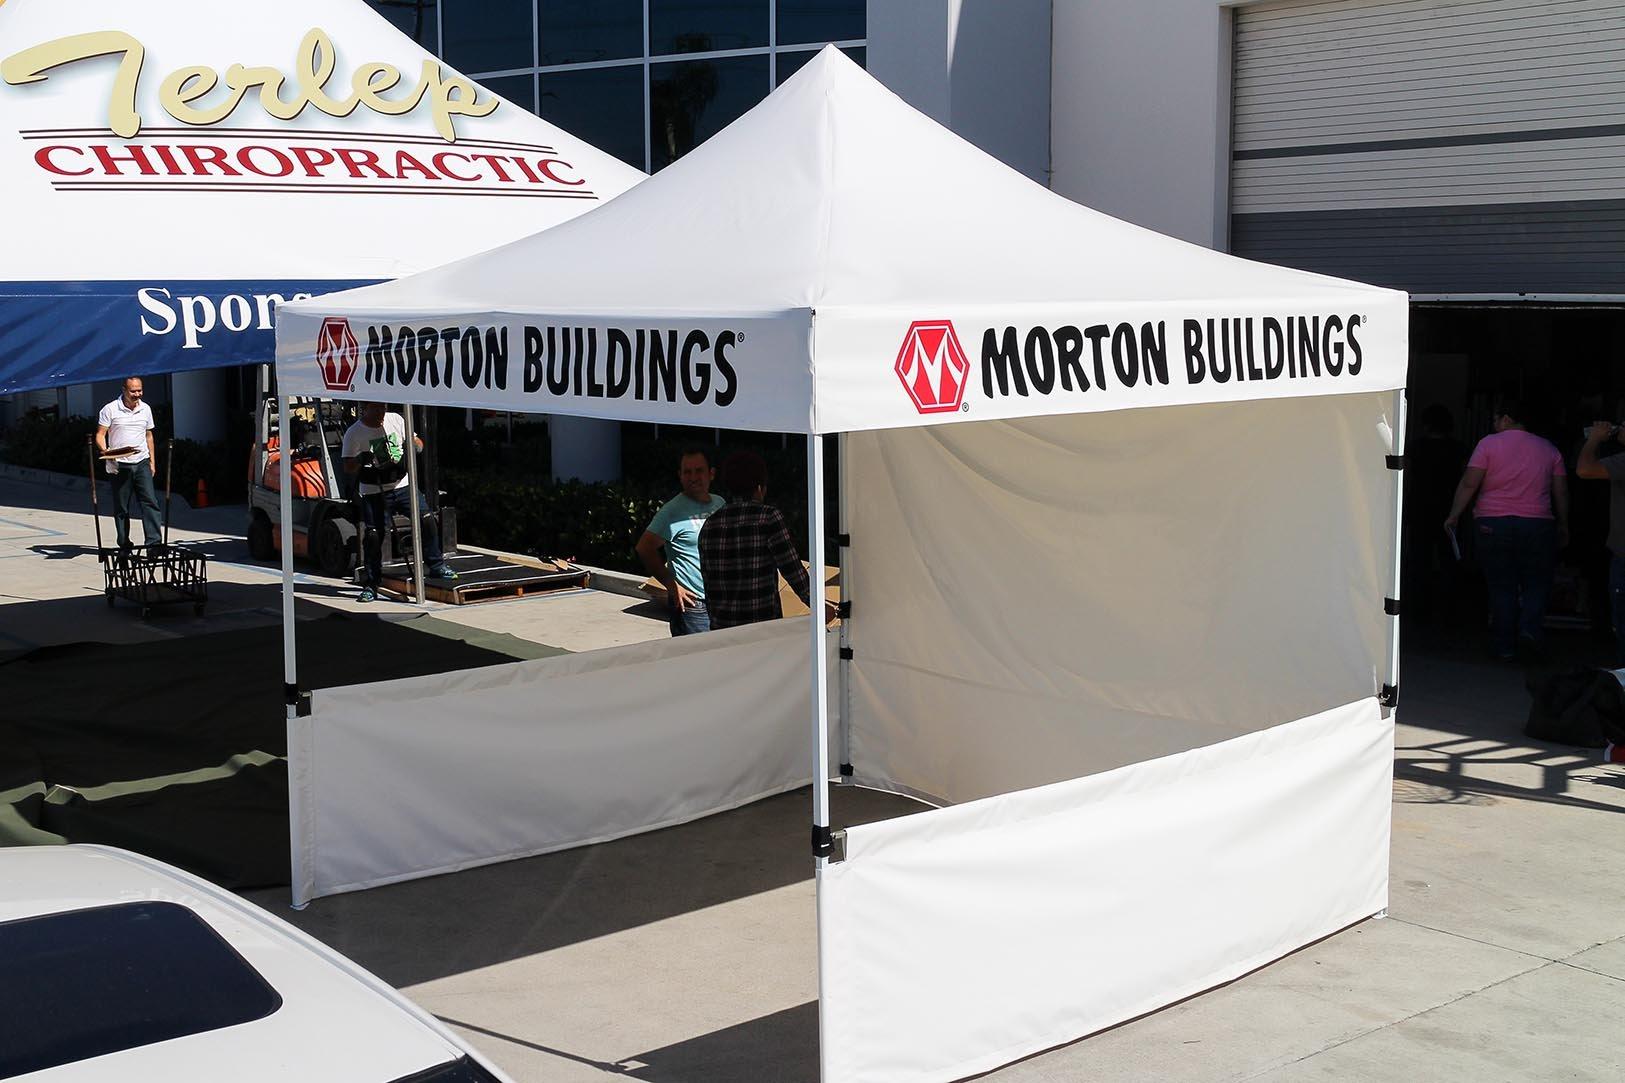 Morton Buildings | Custom Canopies - 10x10 Pop Up Tent